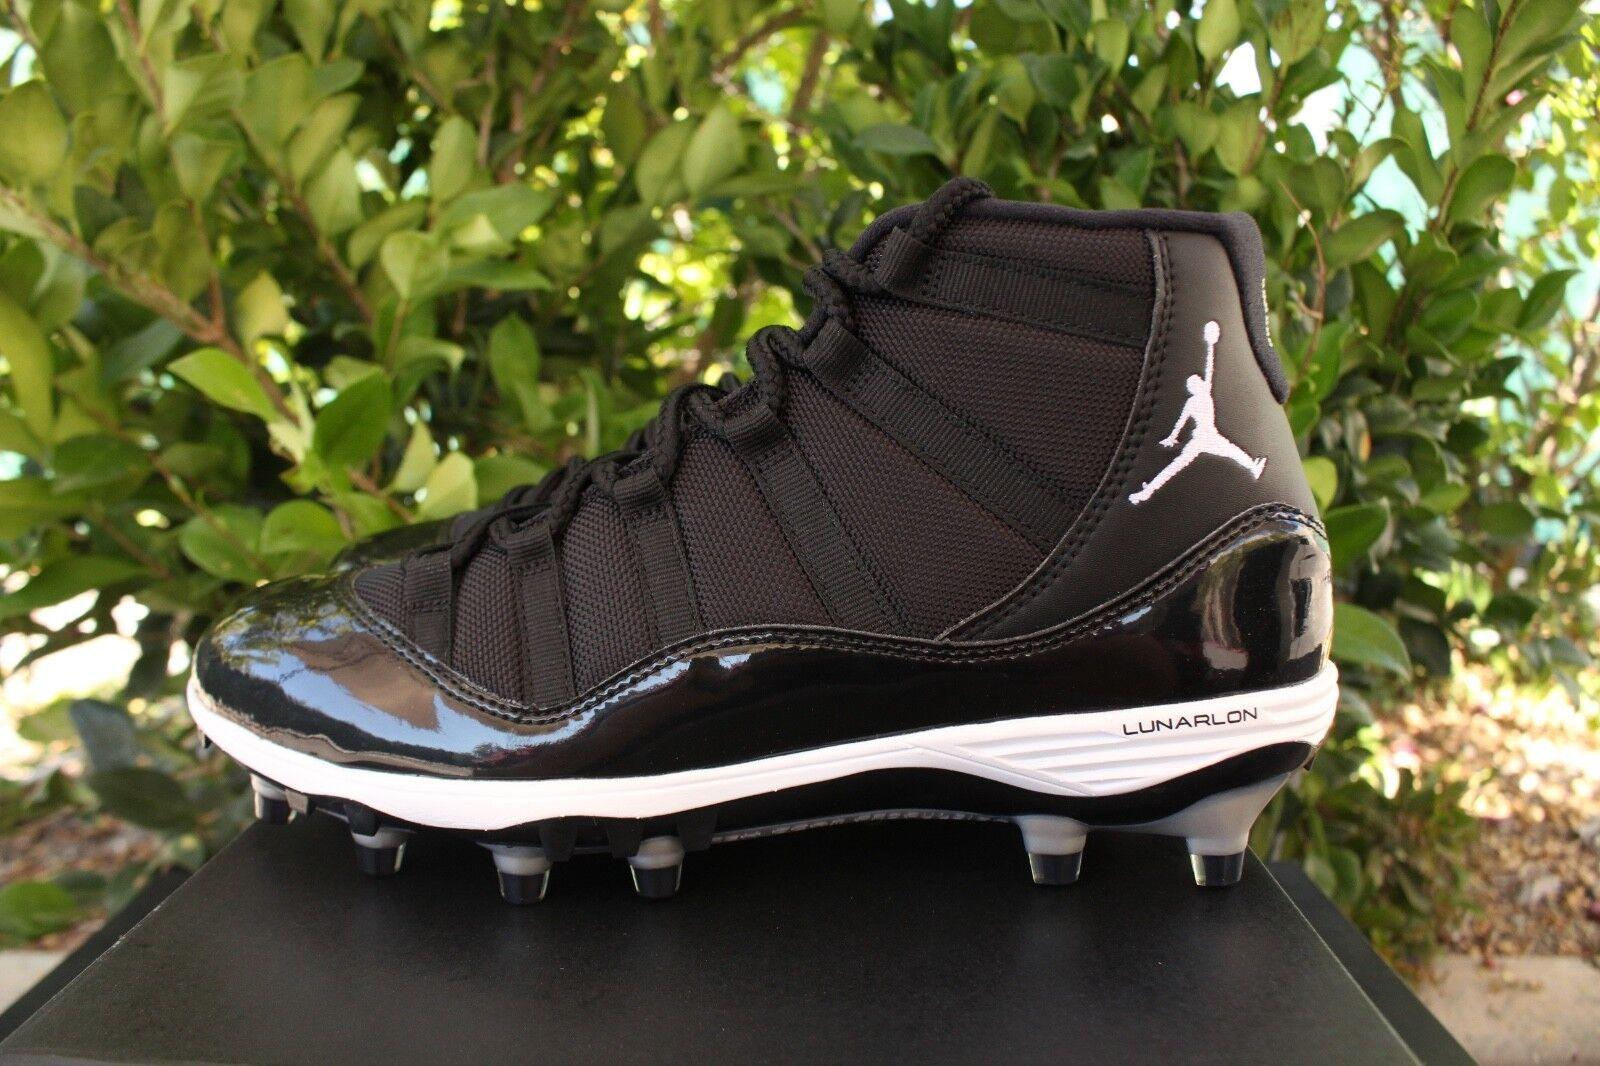 Nike Air Jordan 11 Retro Xi Negro TD Cornamusa Sz 10.5 Negro Xi Blanco Plata AO1561011 0b5aff